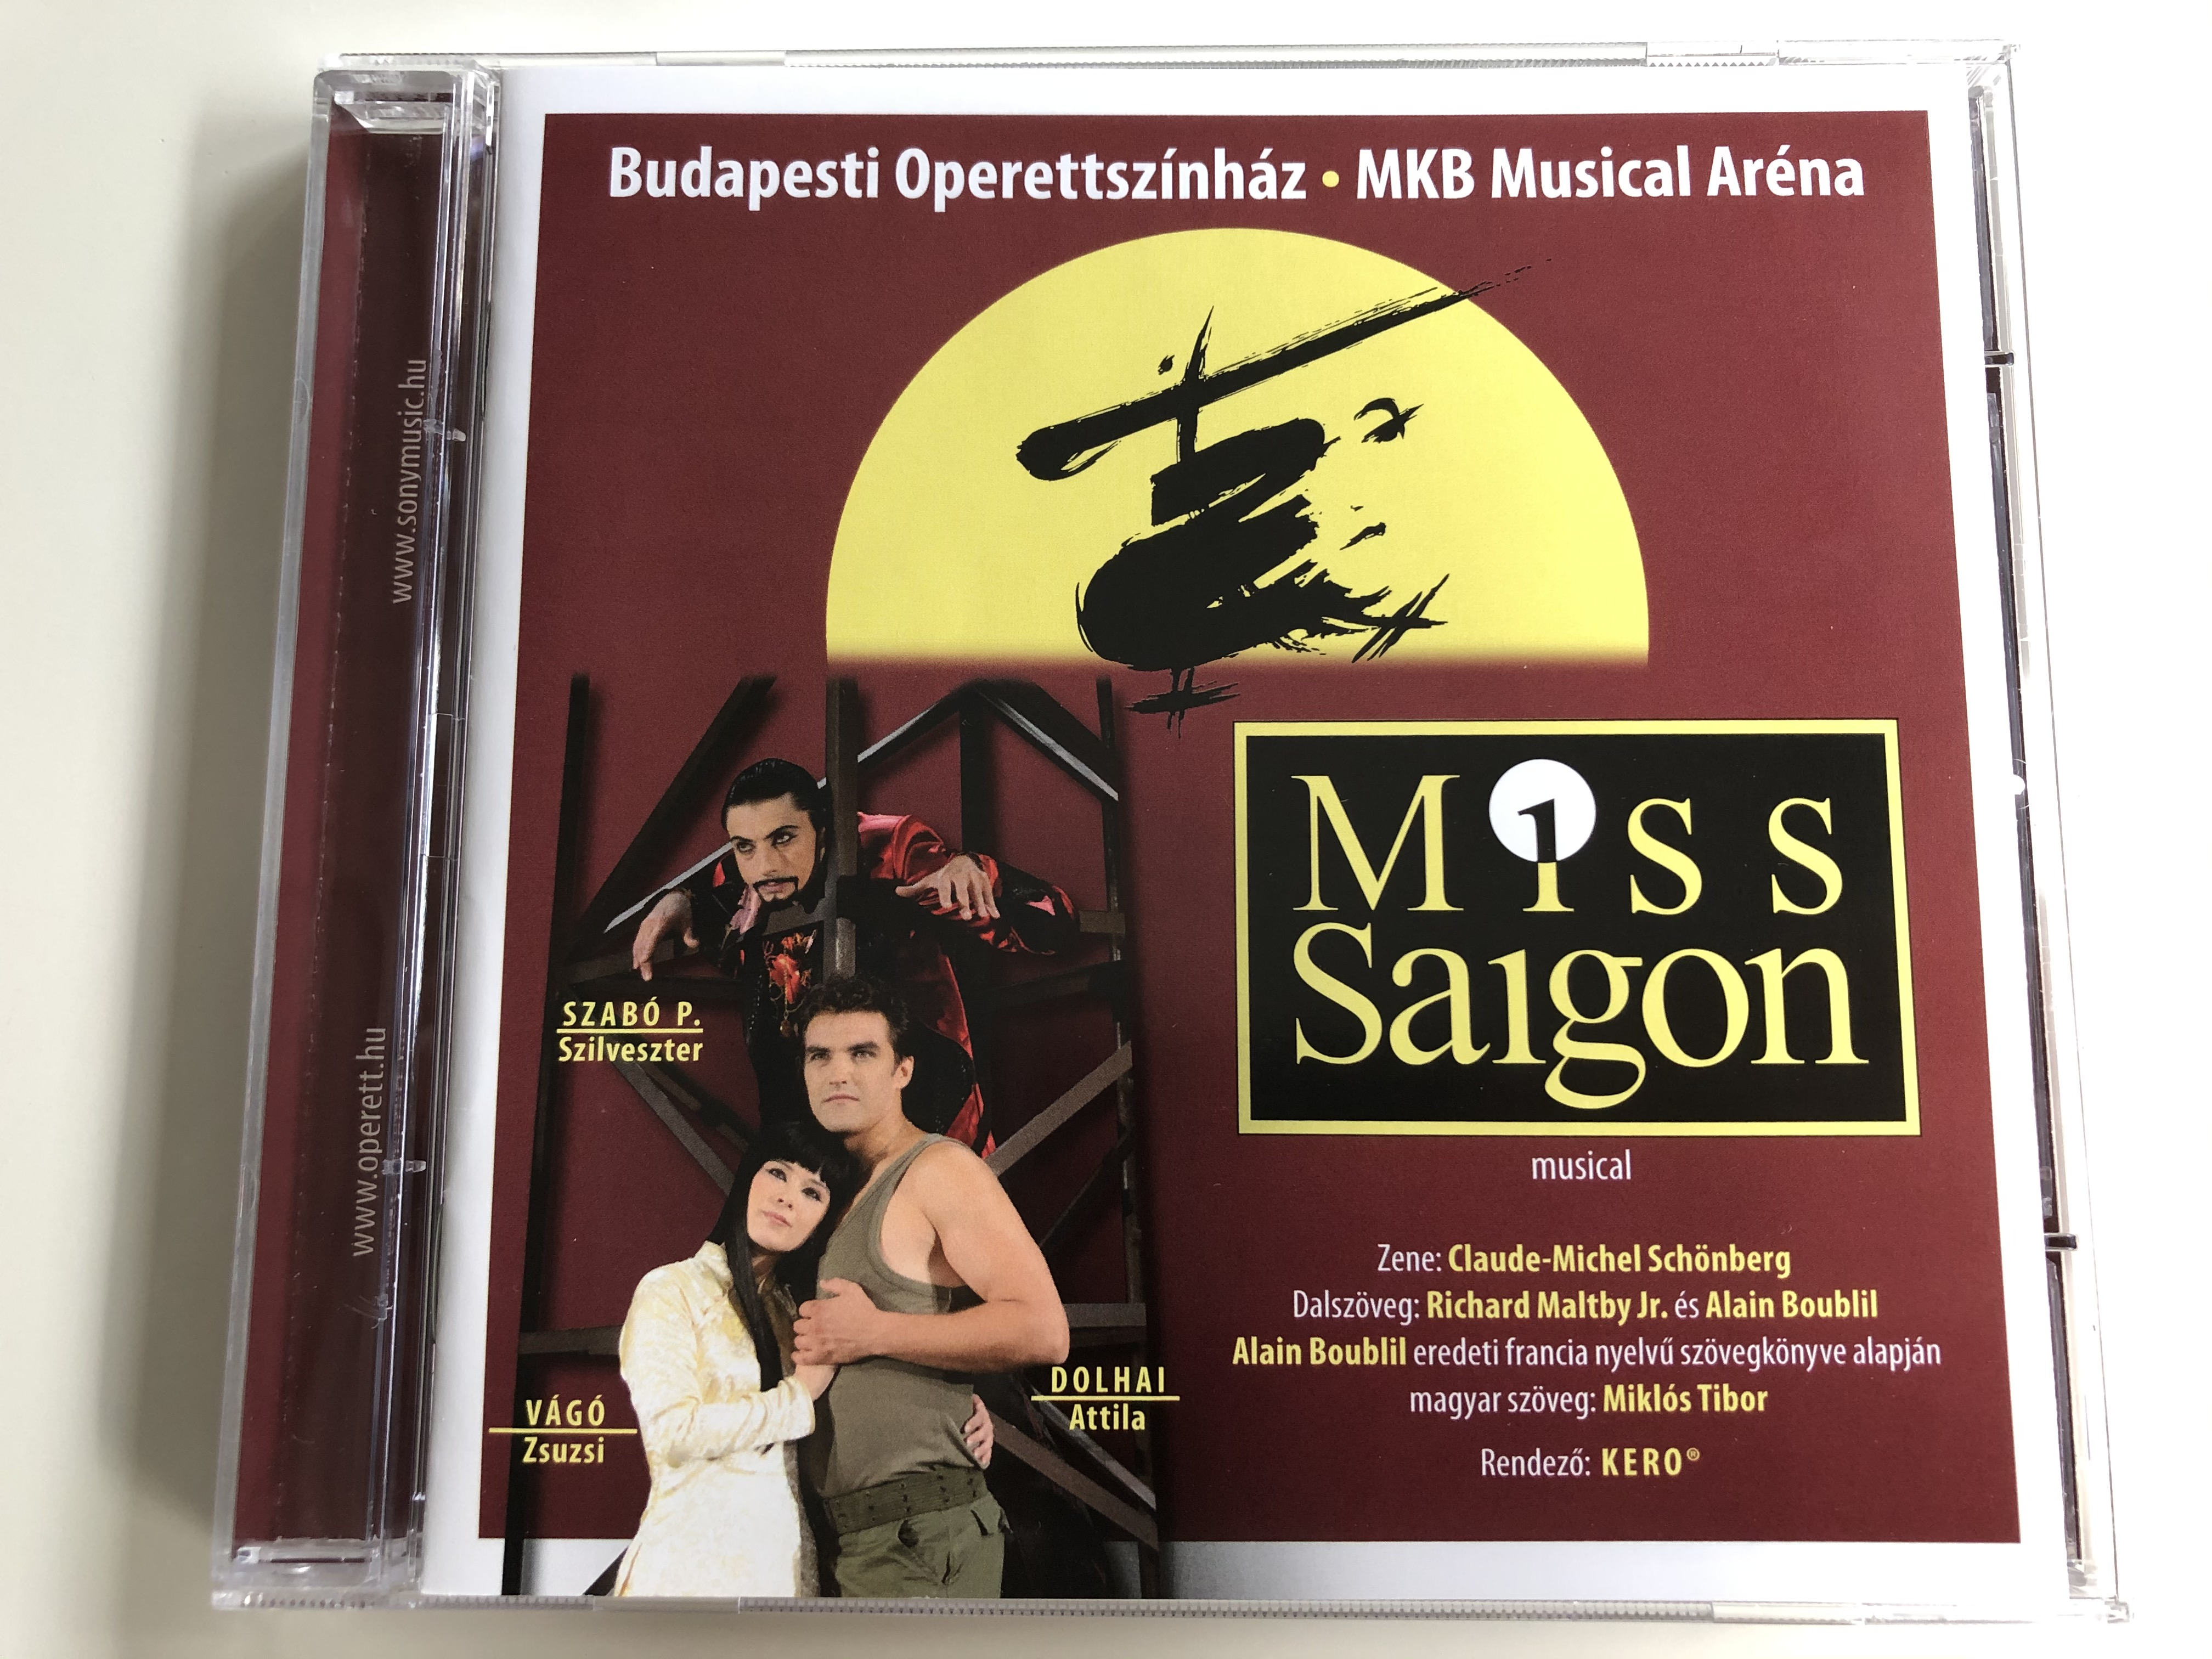 budapest-operettszinhaz-mkb-musical-arena-miss-saigon-musical-zene-claude-michael-schonberg-dalszoveg-richard-maltby-jr.-es-alain-boubil-sony-music-entertainment-audio-cd-2012-887654424020-1-.jpg